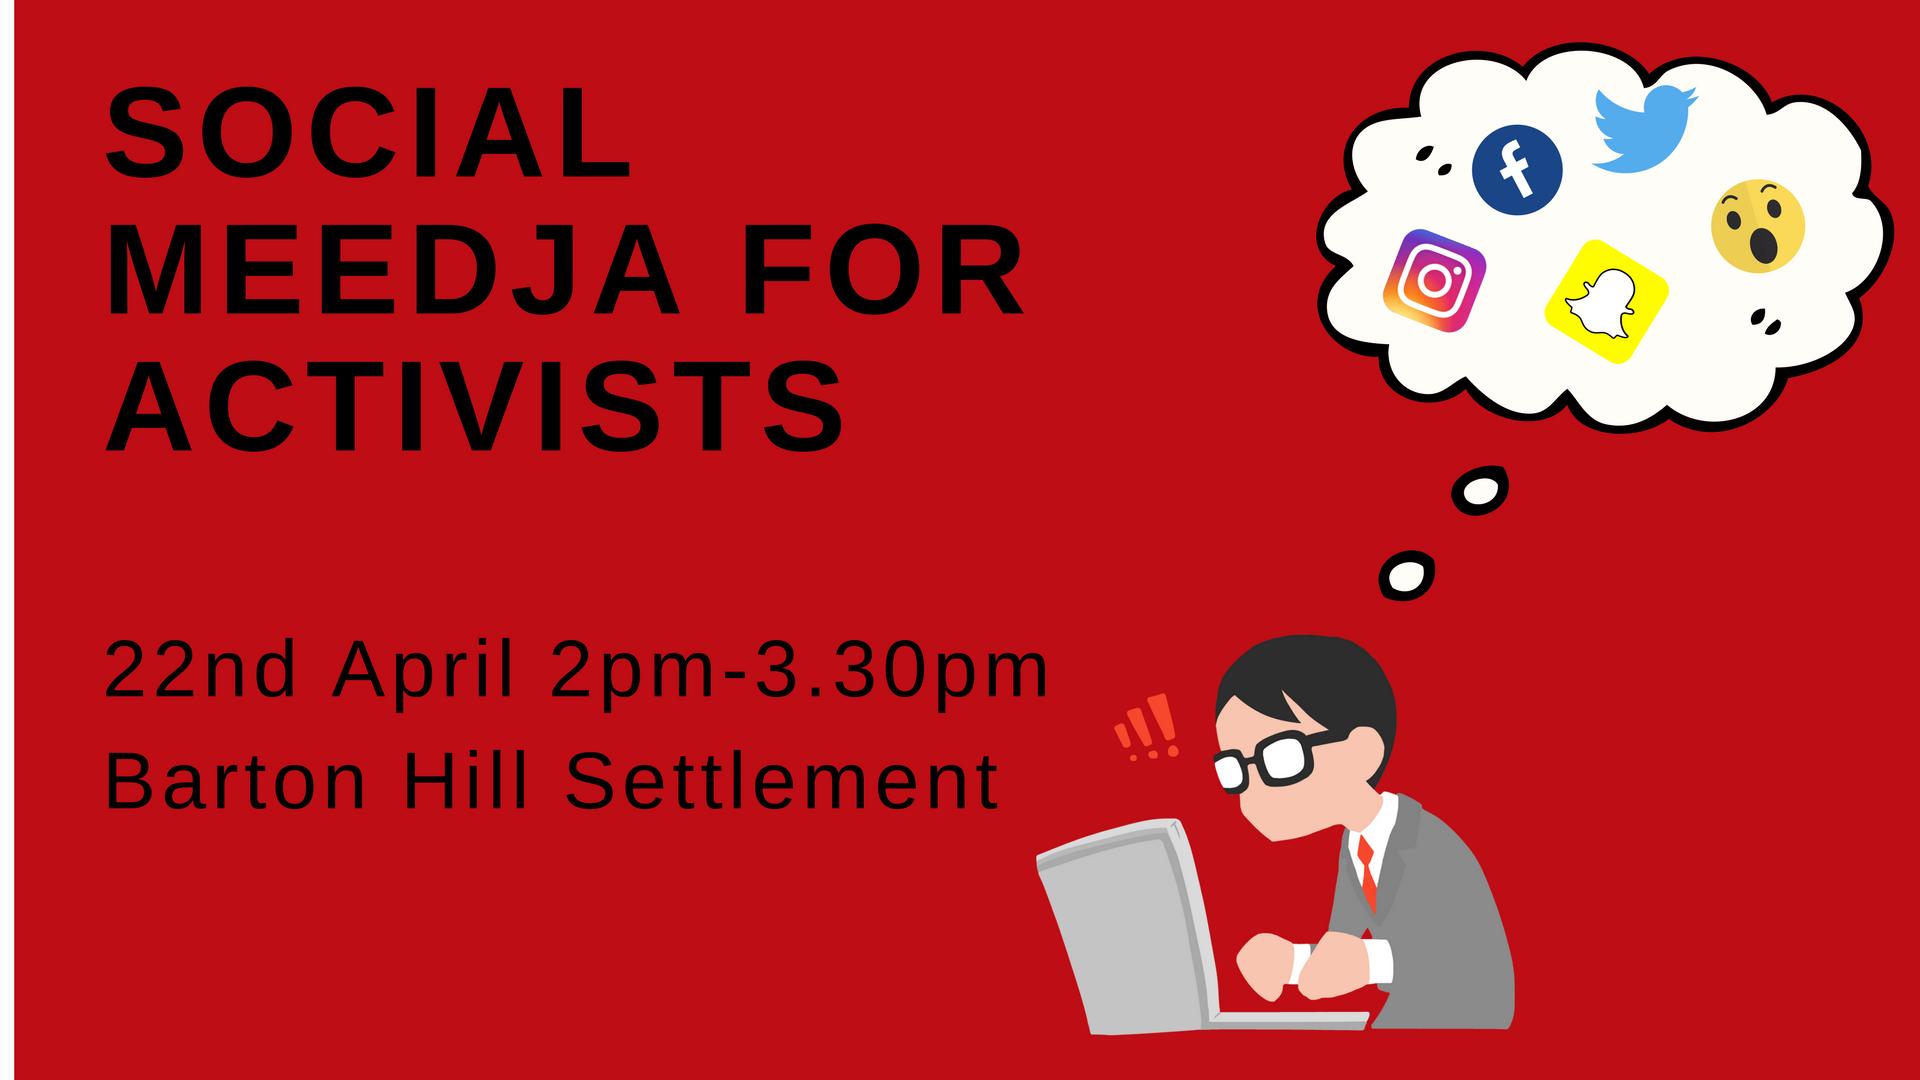 Social Meedja For Activists